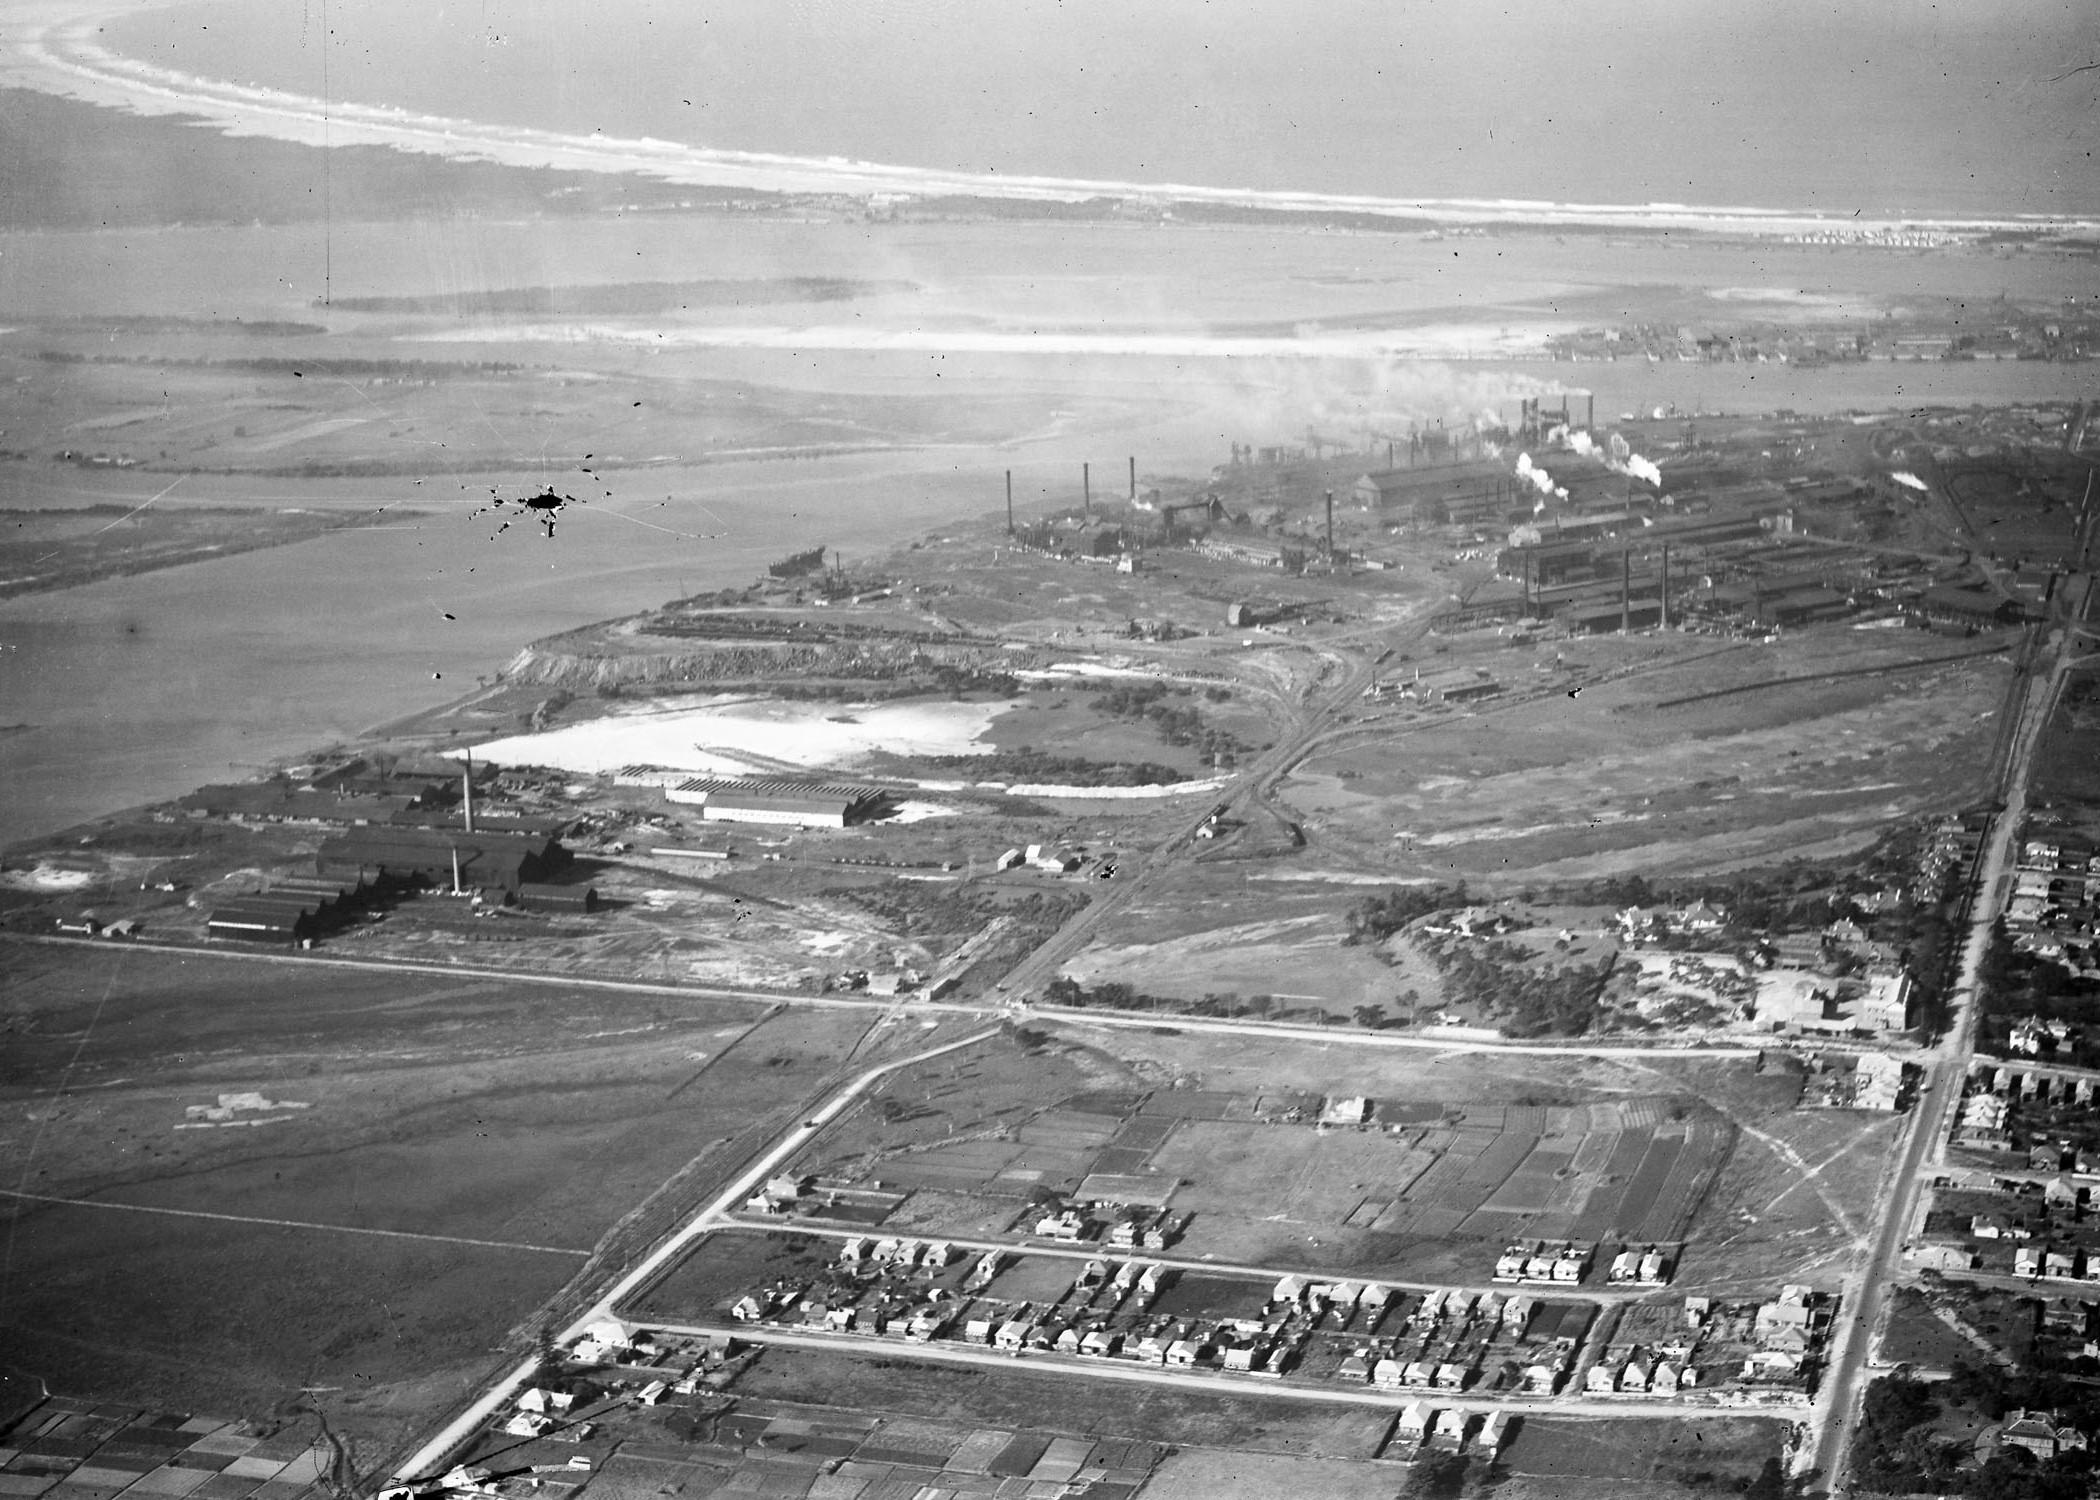 Newcastle aerial, 1930 (Image 59 Courtesy of Phillip Warren)